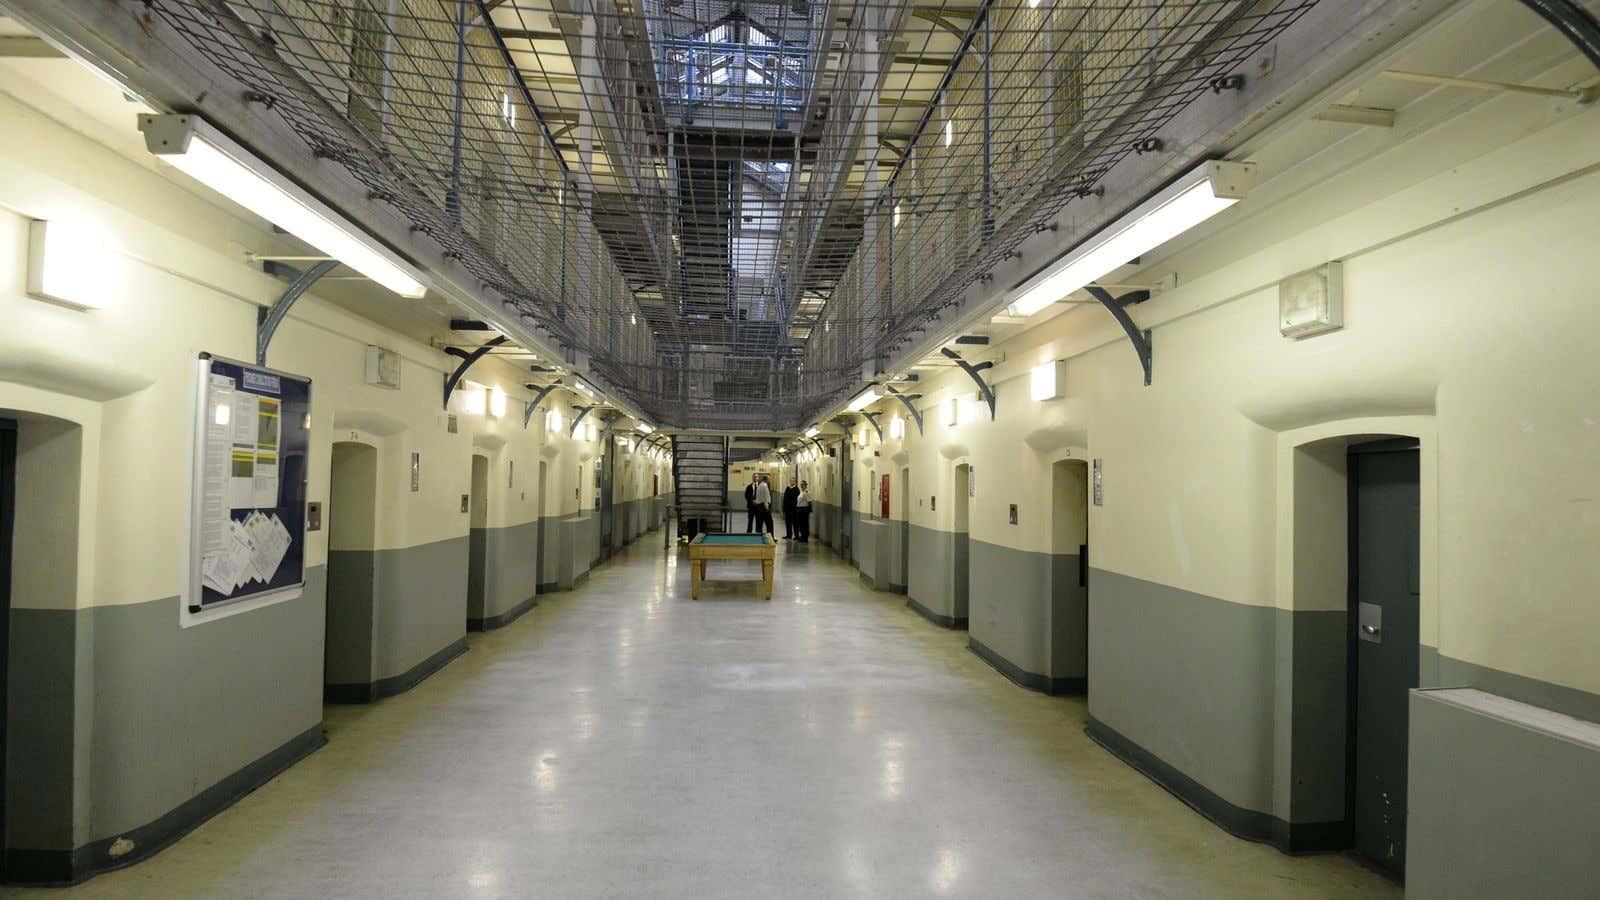 skynews-wormwood-scrubs-prison_4219148